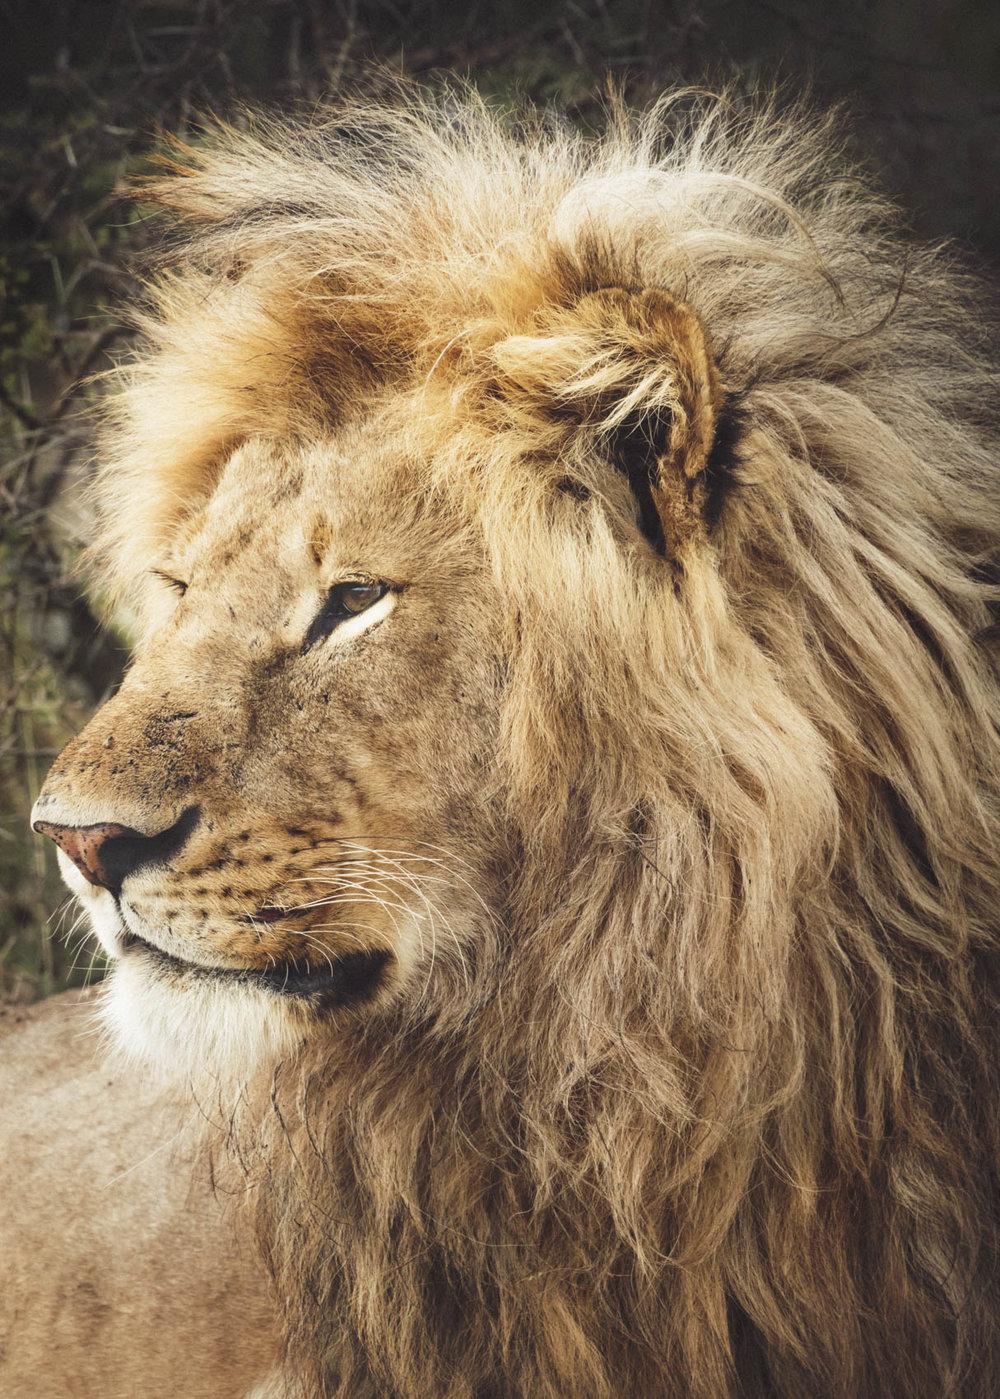 37_STOKES_LION.JPG